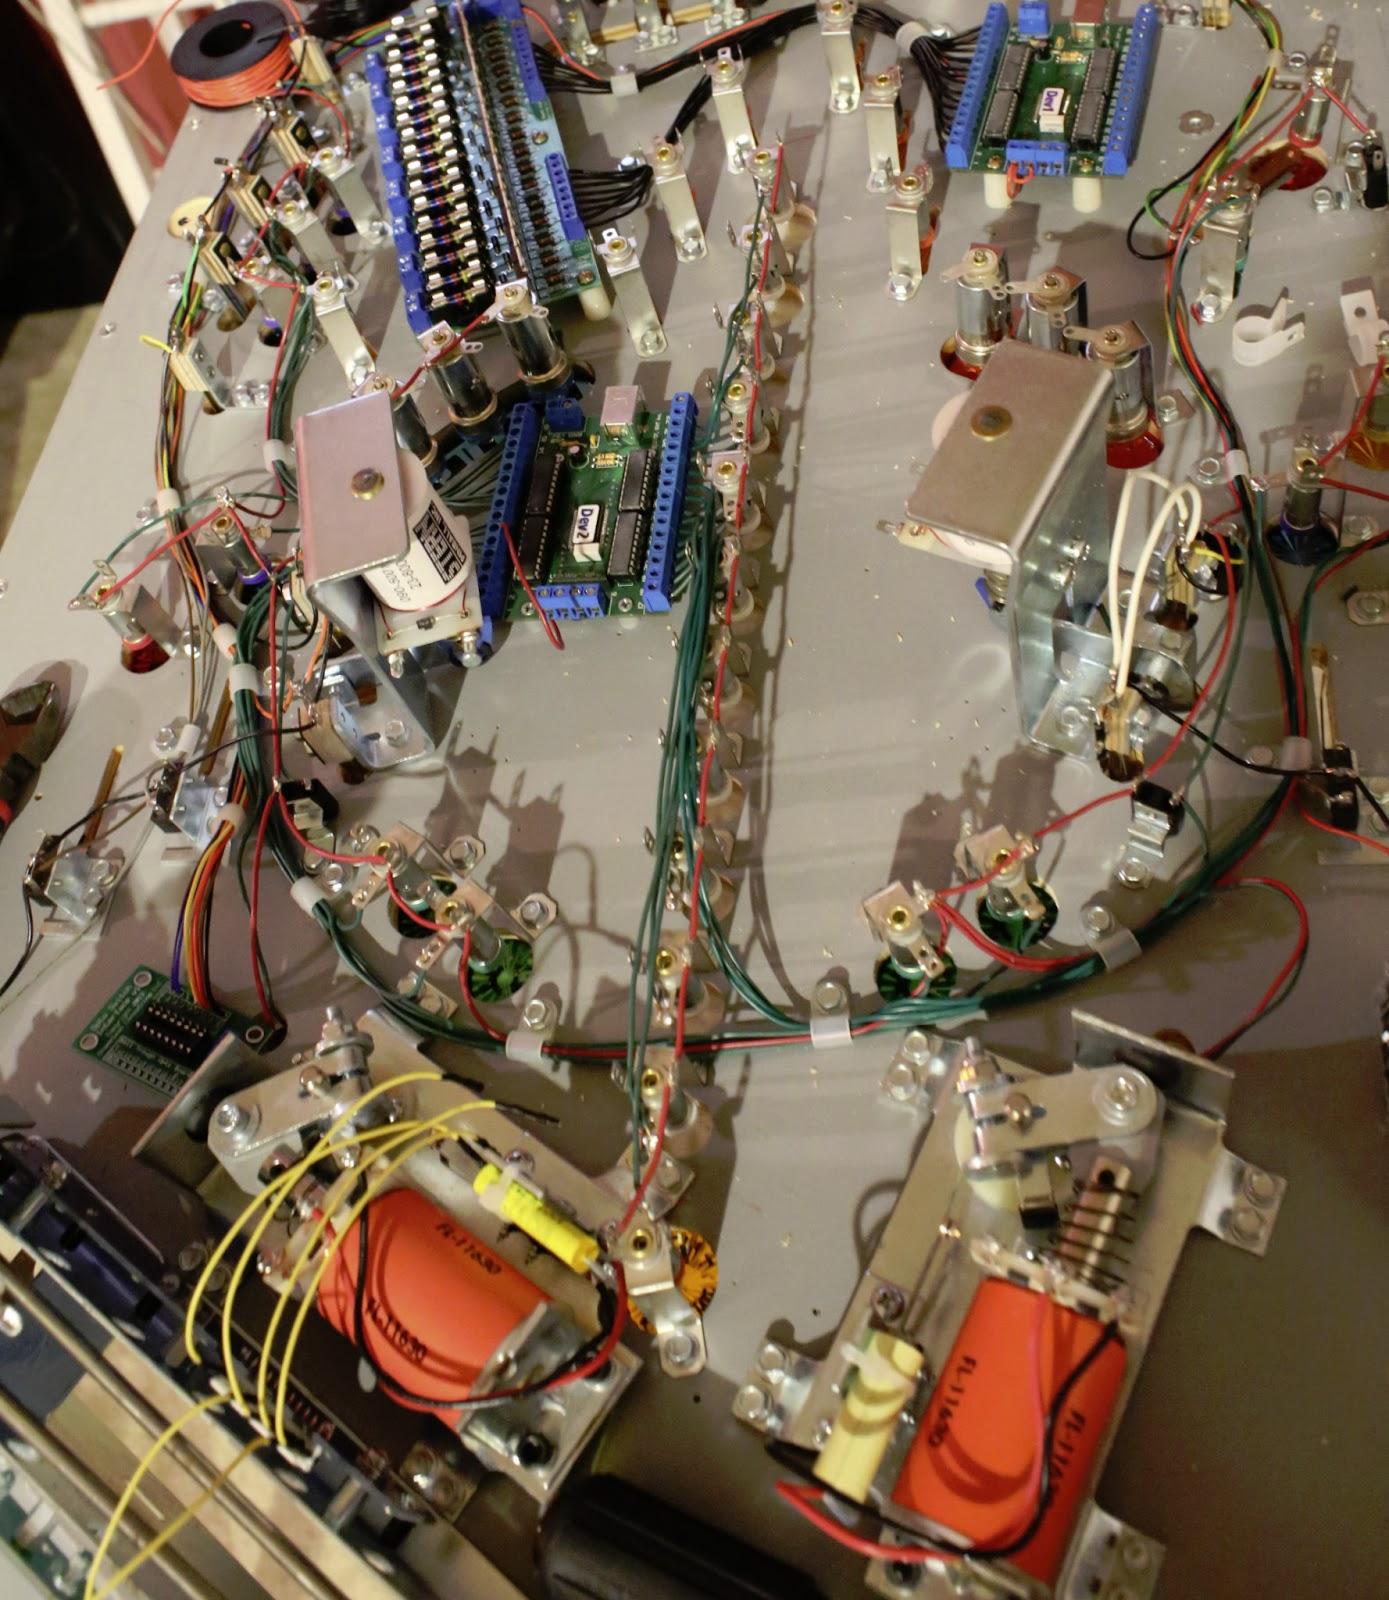 pinball chameleon s guide to diy pinball machine construction the modern firepower pinball